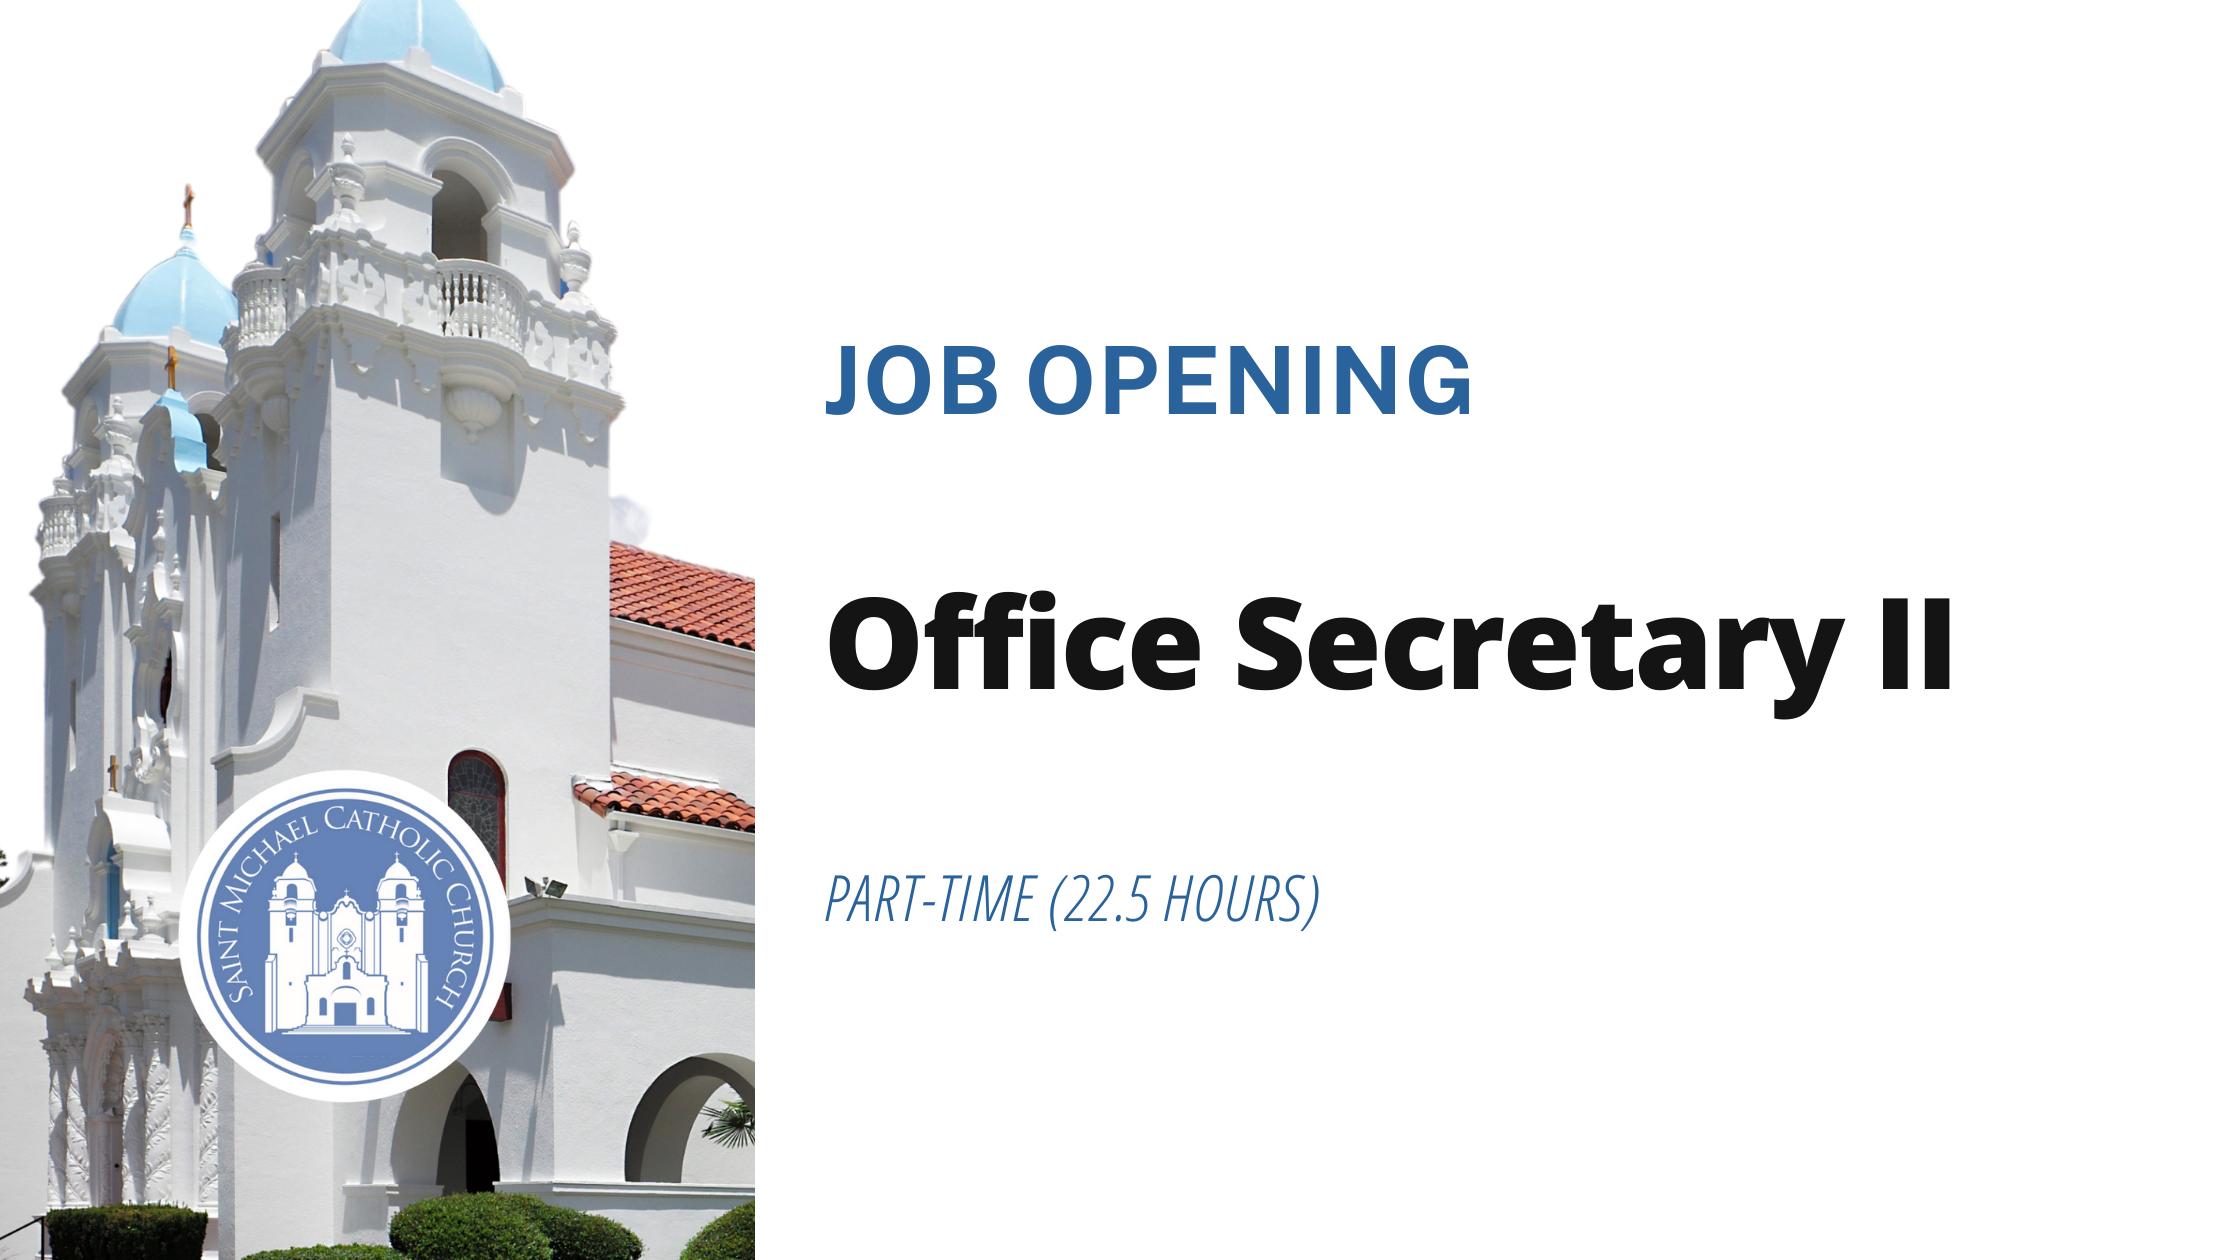 Office Secretary Job Opening